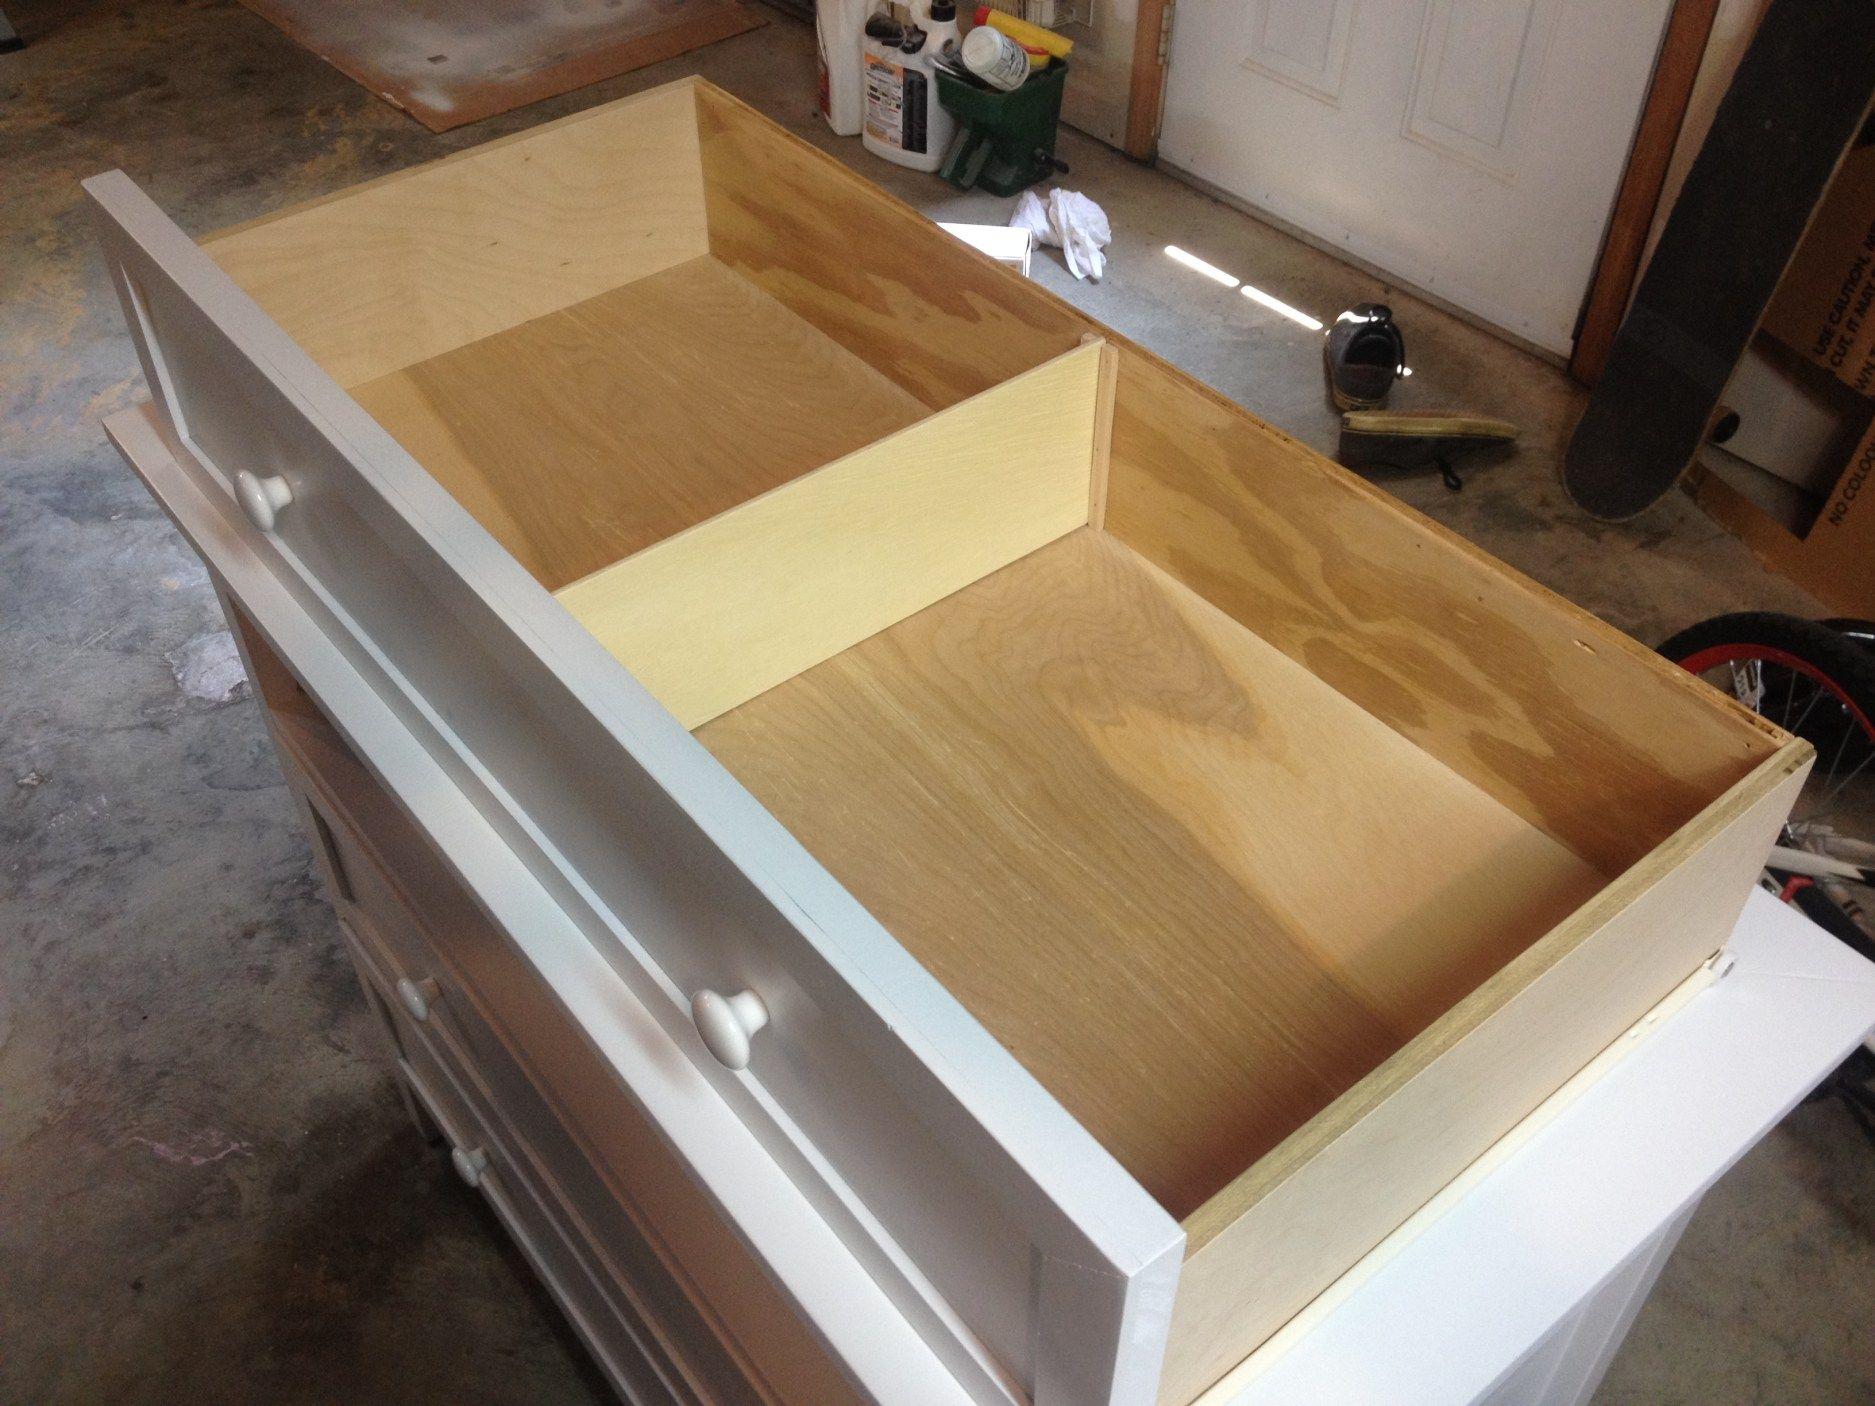 DIY Emerson Dresser How To Build Dresser plans